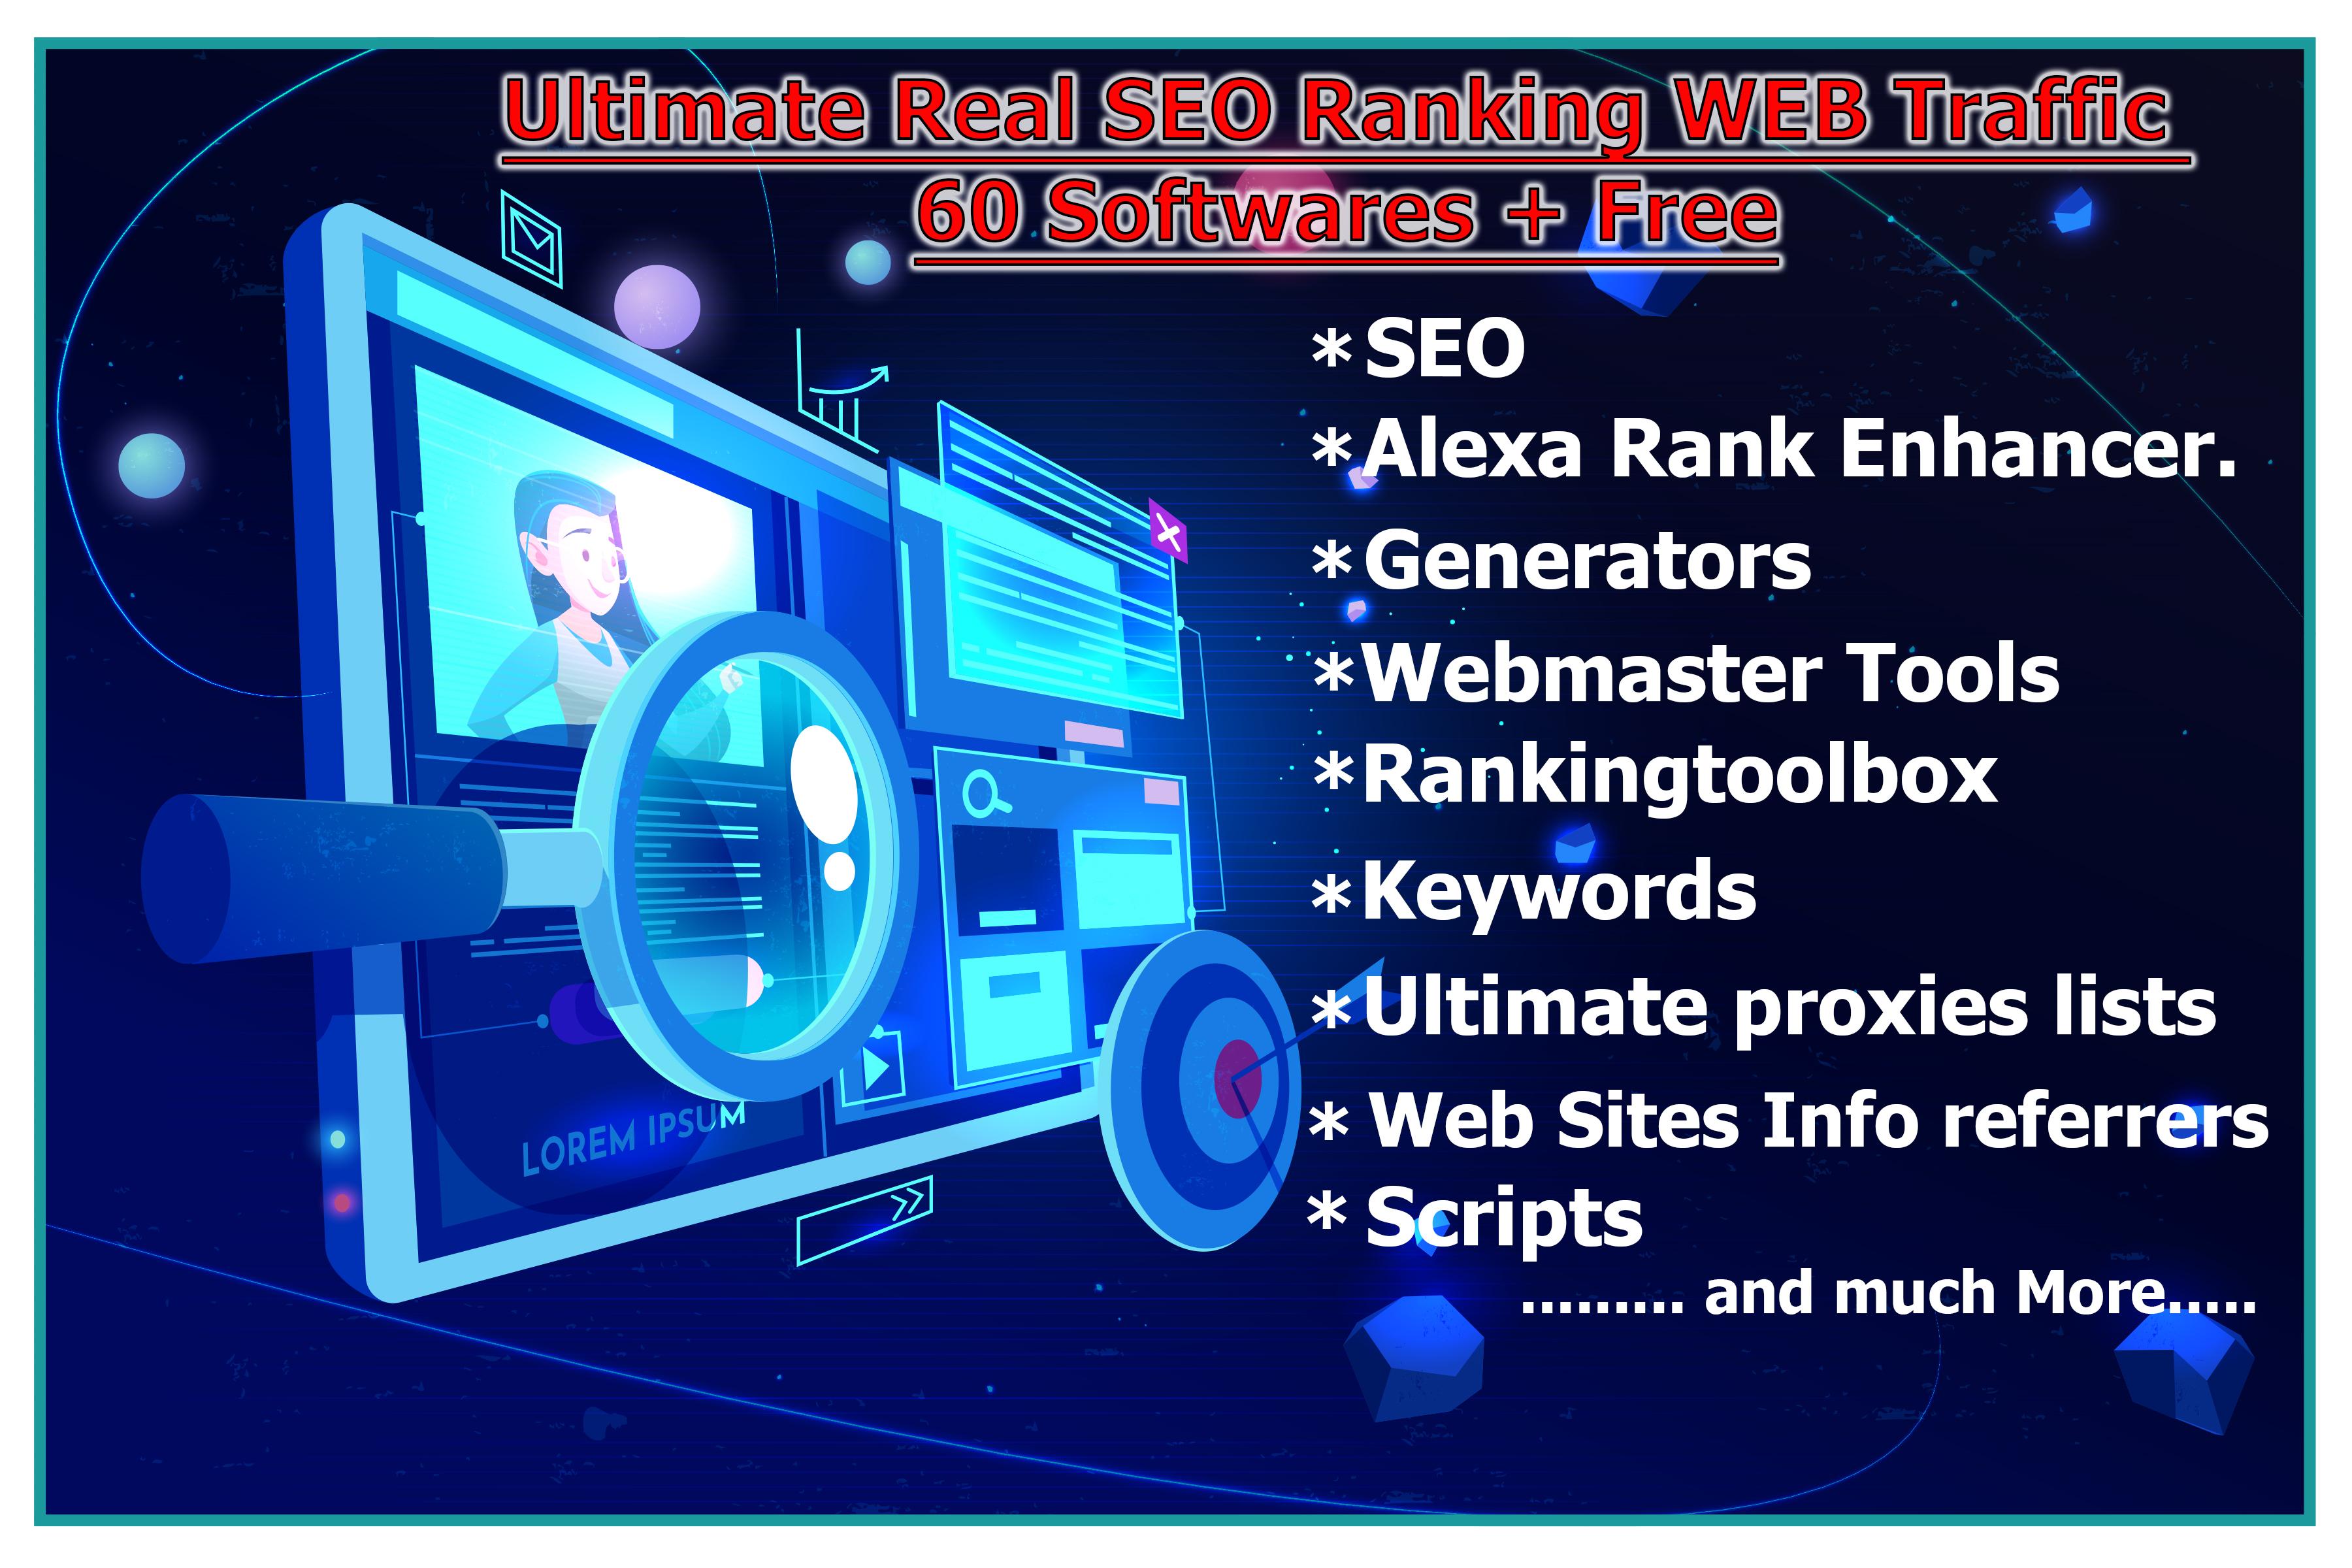 Ultimate Real SEO Ranking WEB Traffic 60 Softwares + Free